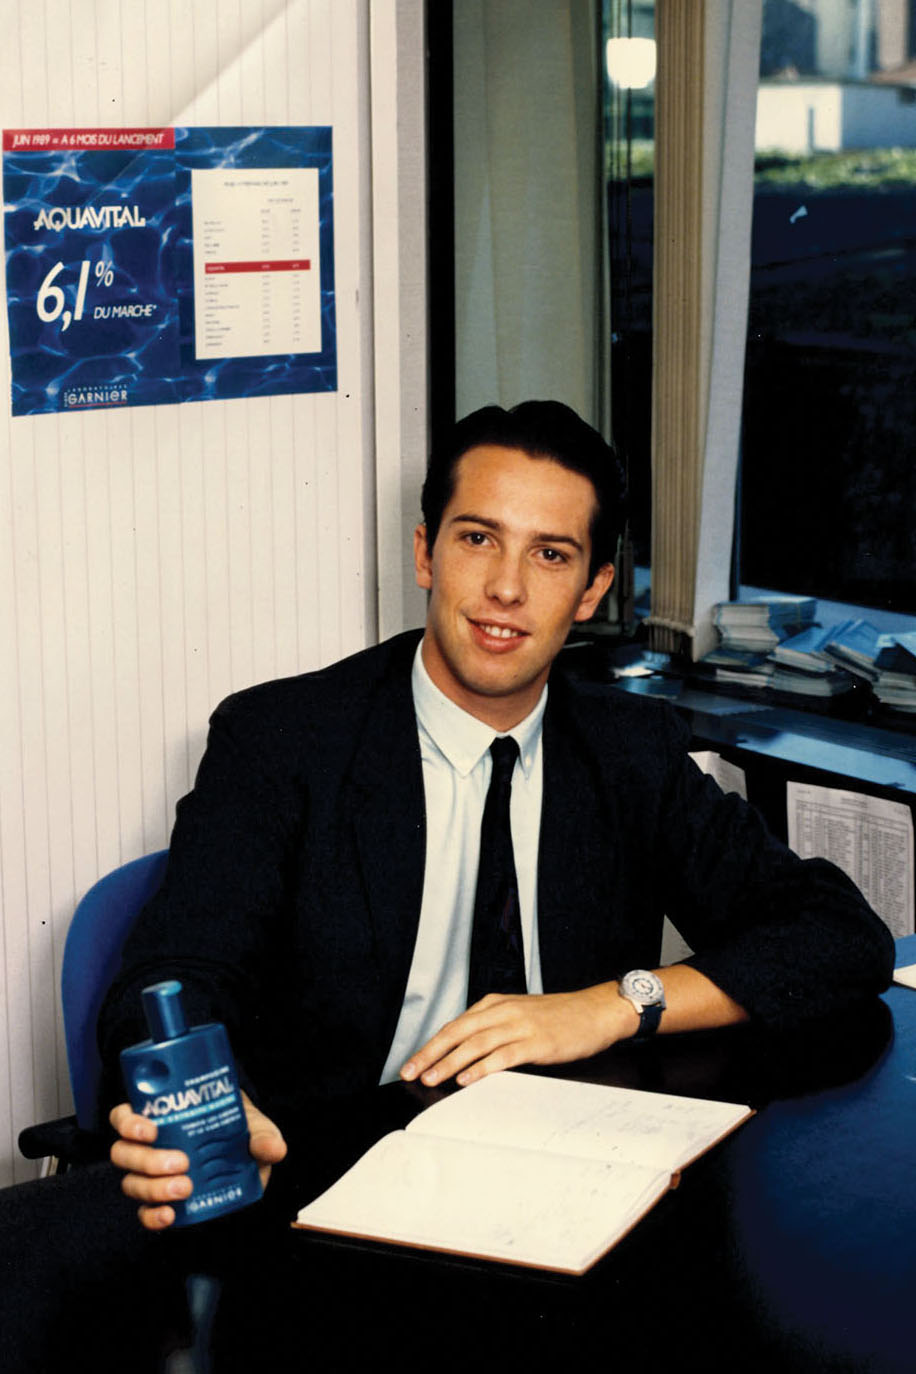 Nicolas as a young executive at the launch of Garnier Aquavital.